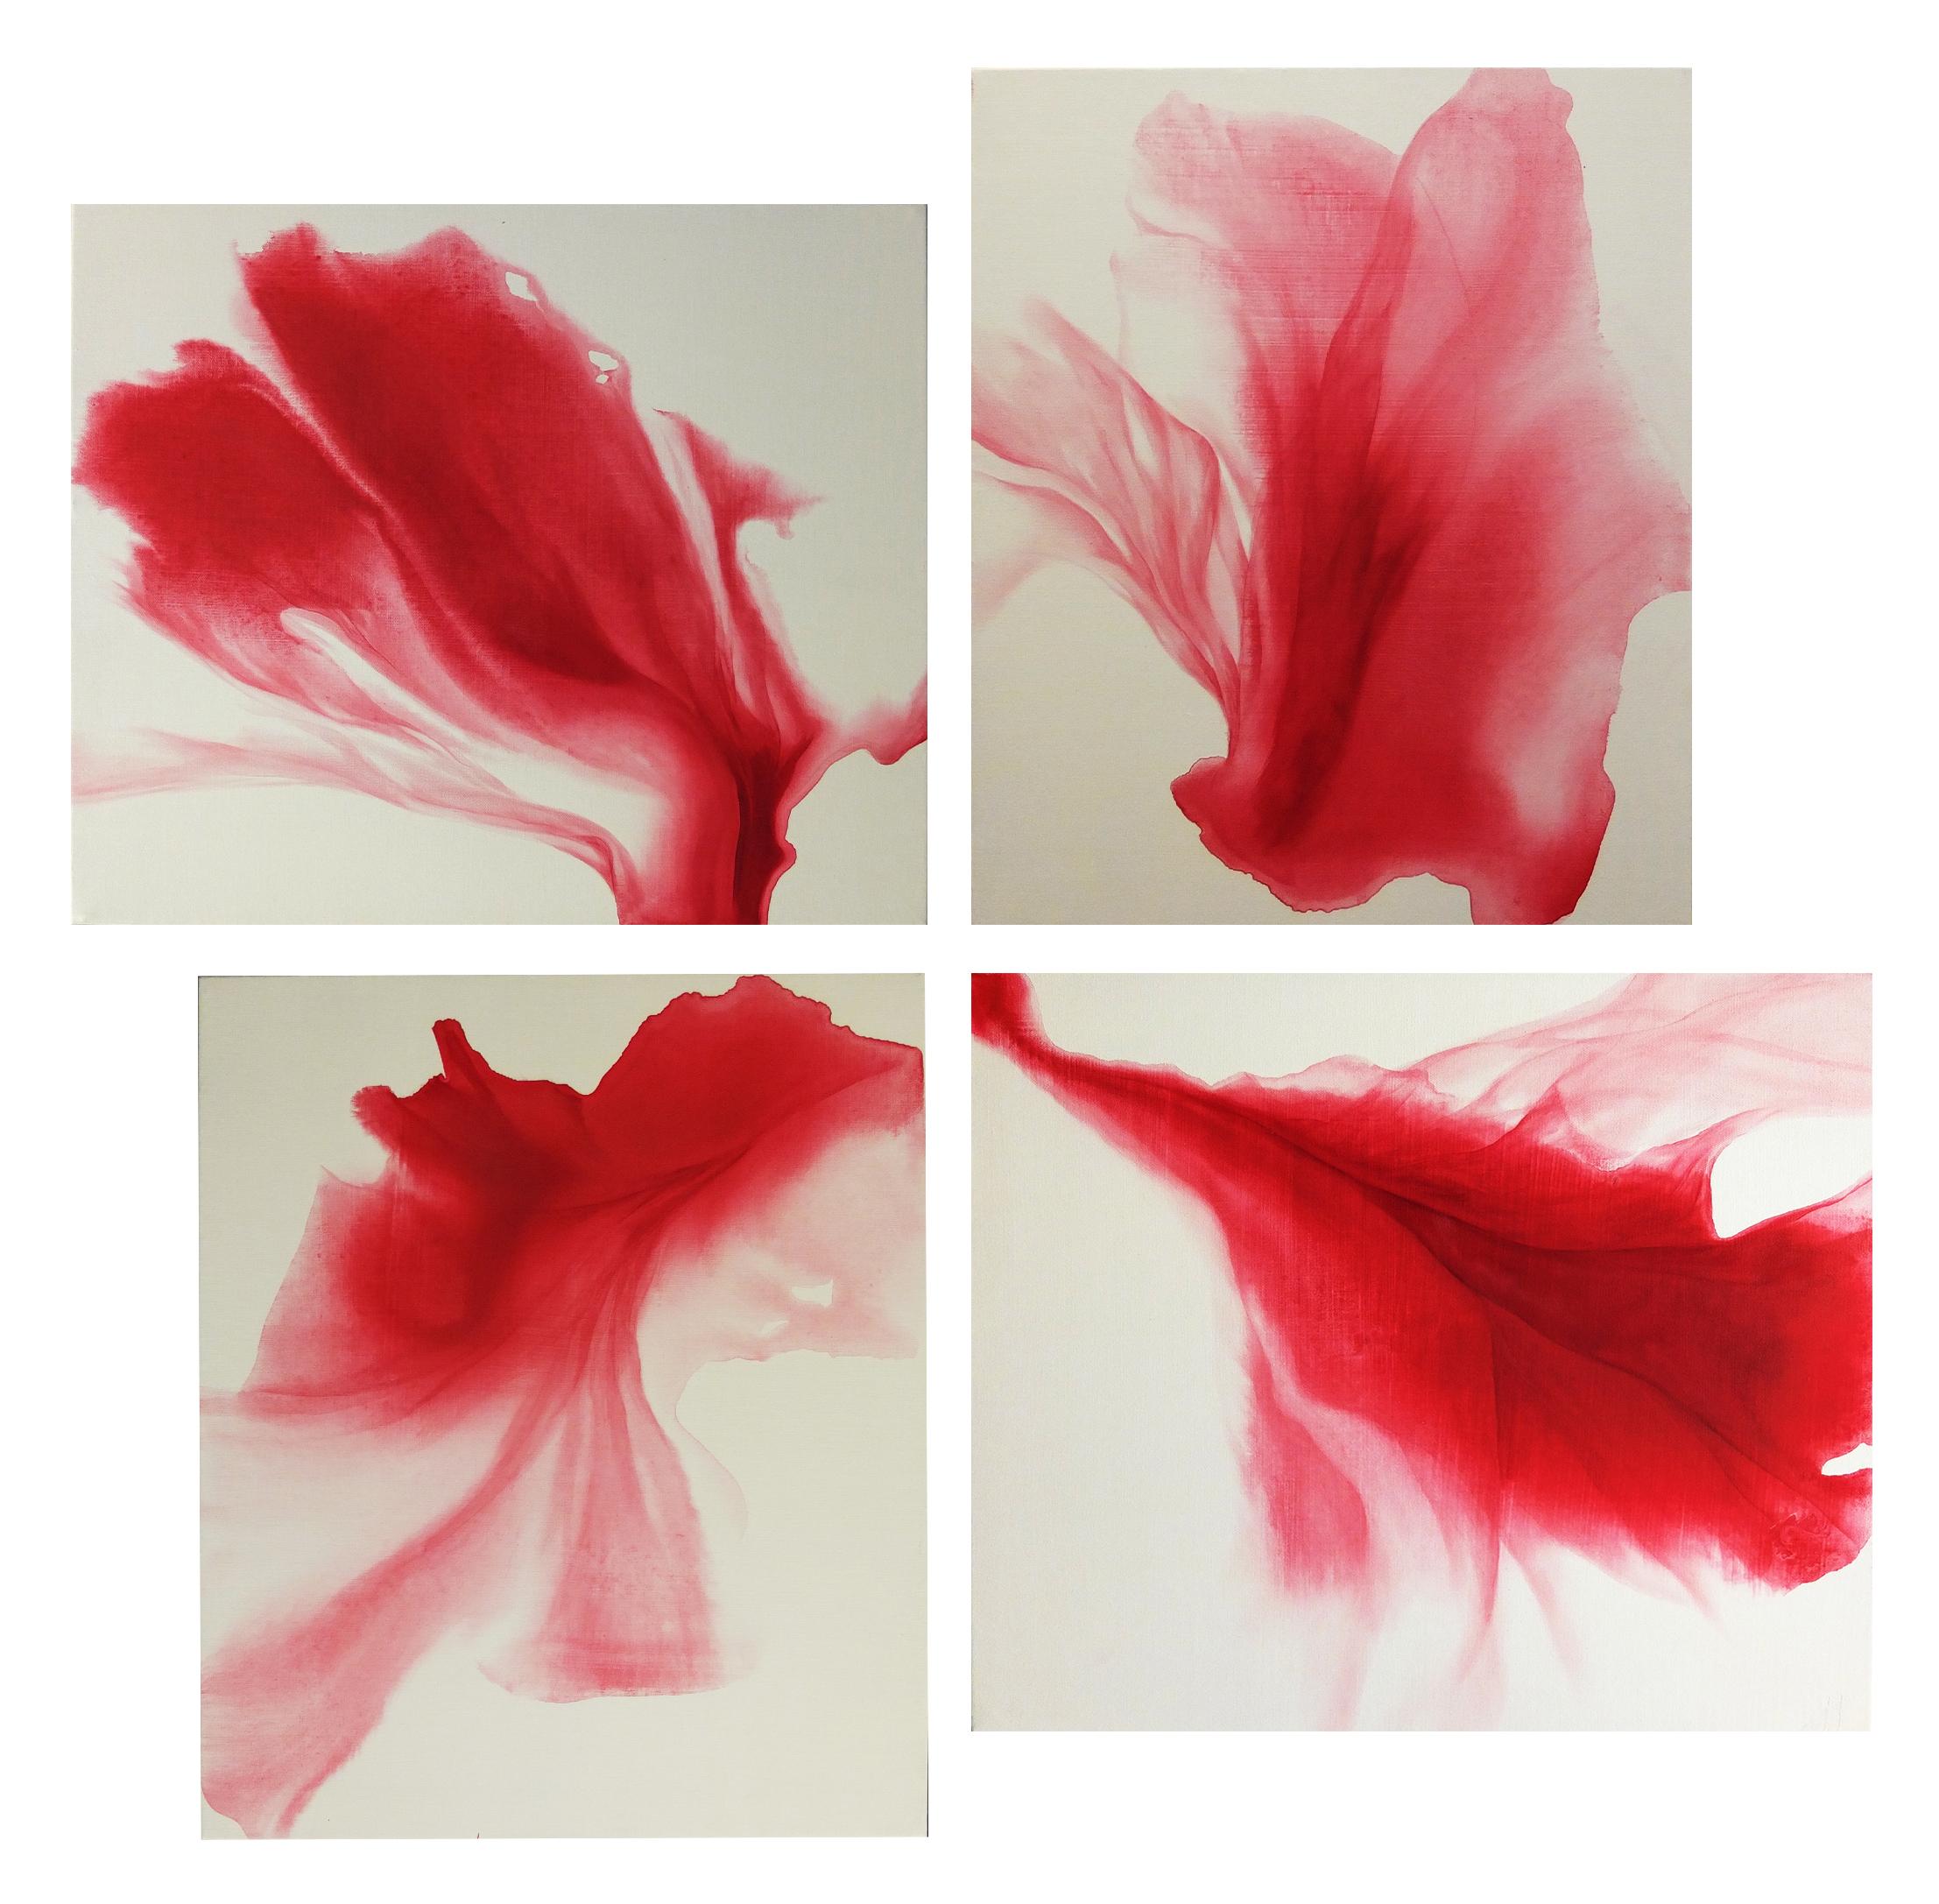 ephemeral_05  oil on canvas  53 X 45.5 cm / per each  2017